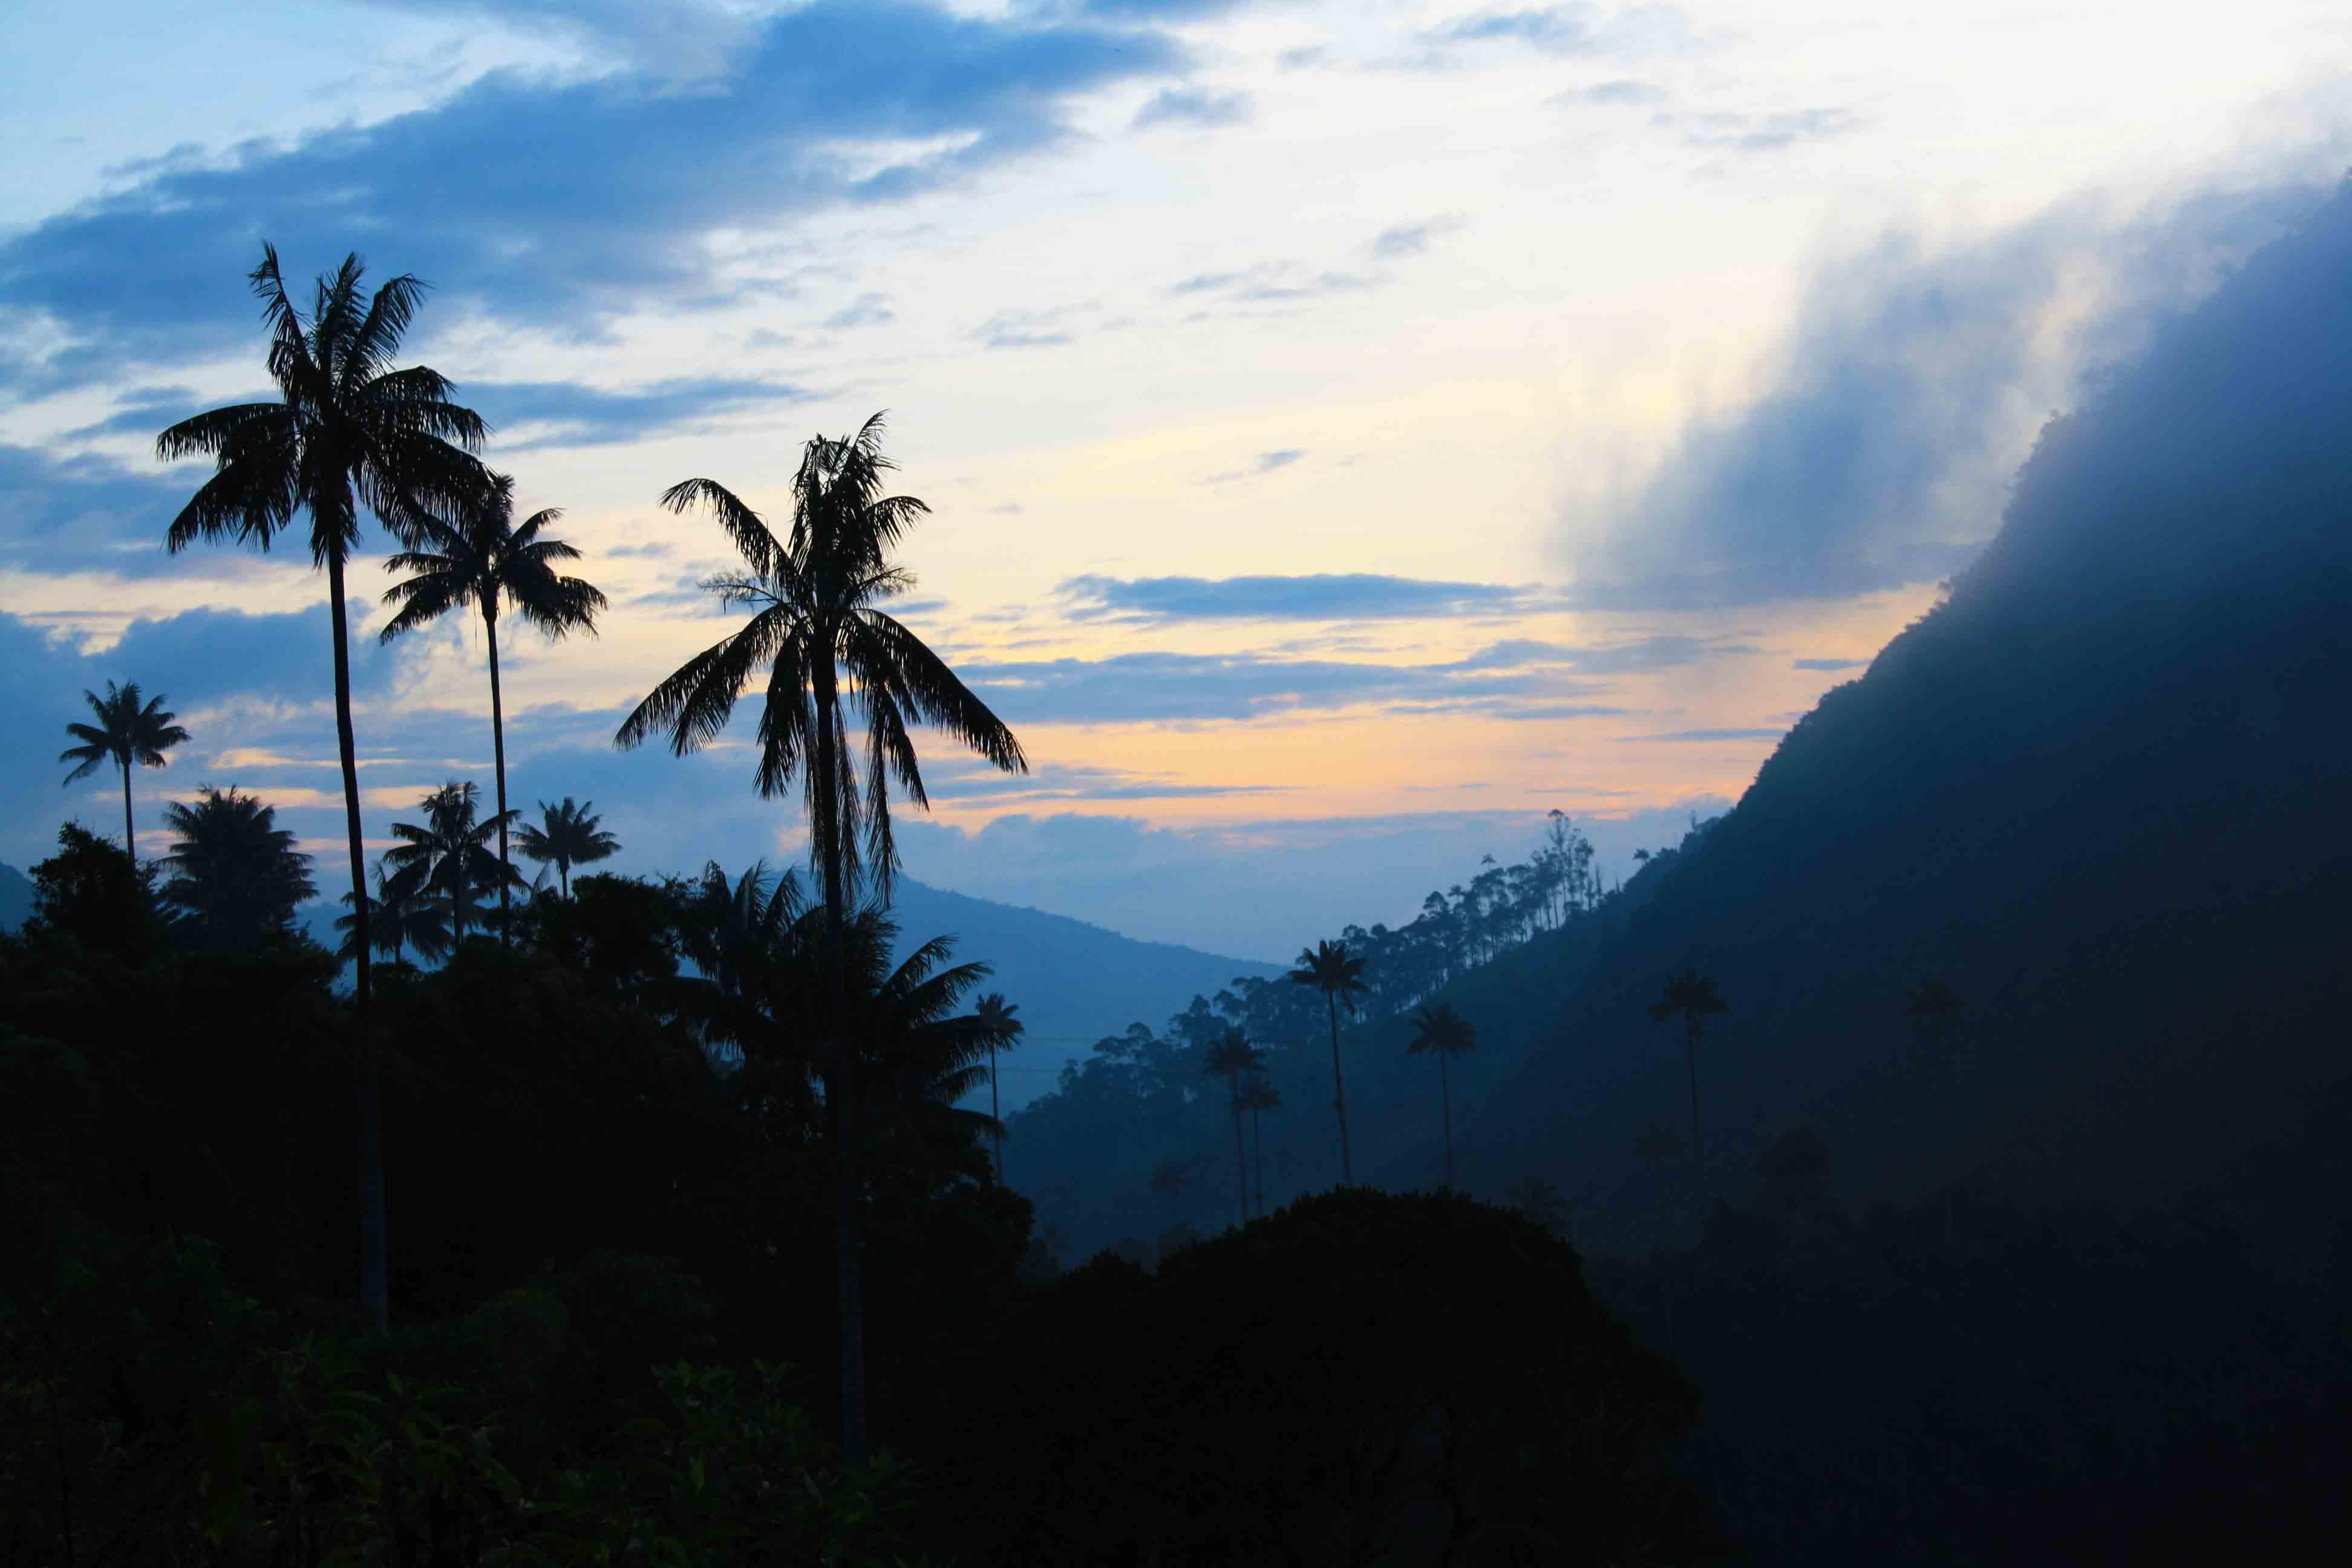 sunset valle del cocora